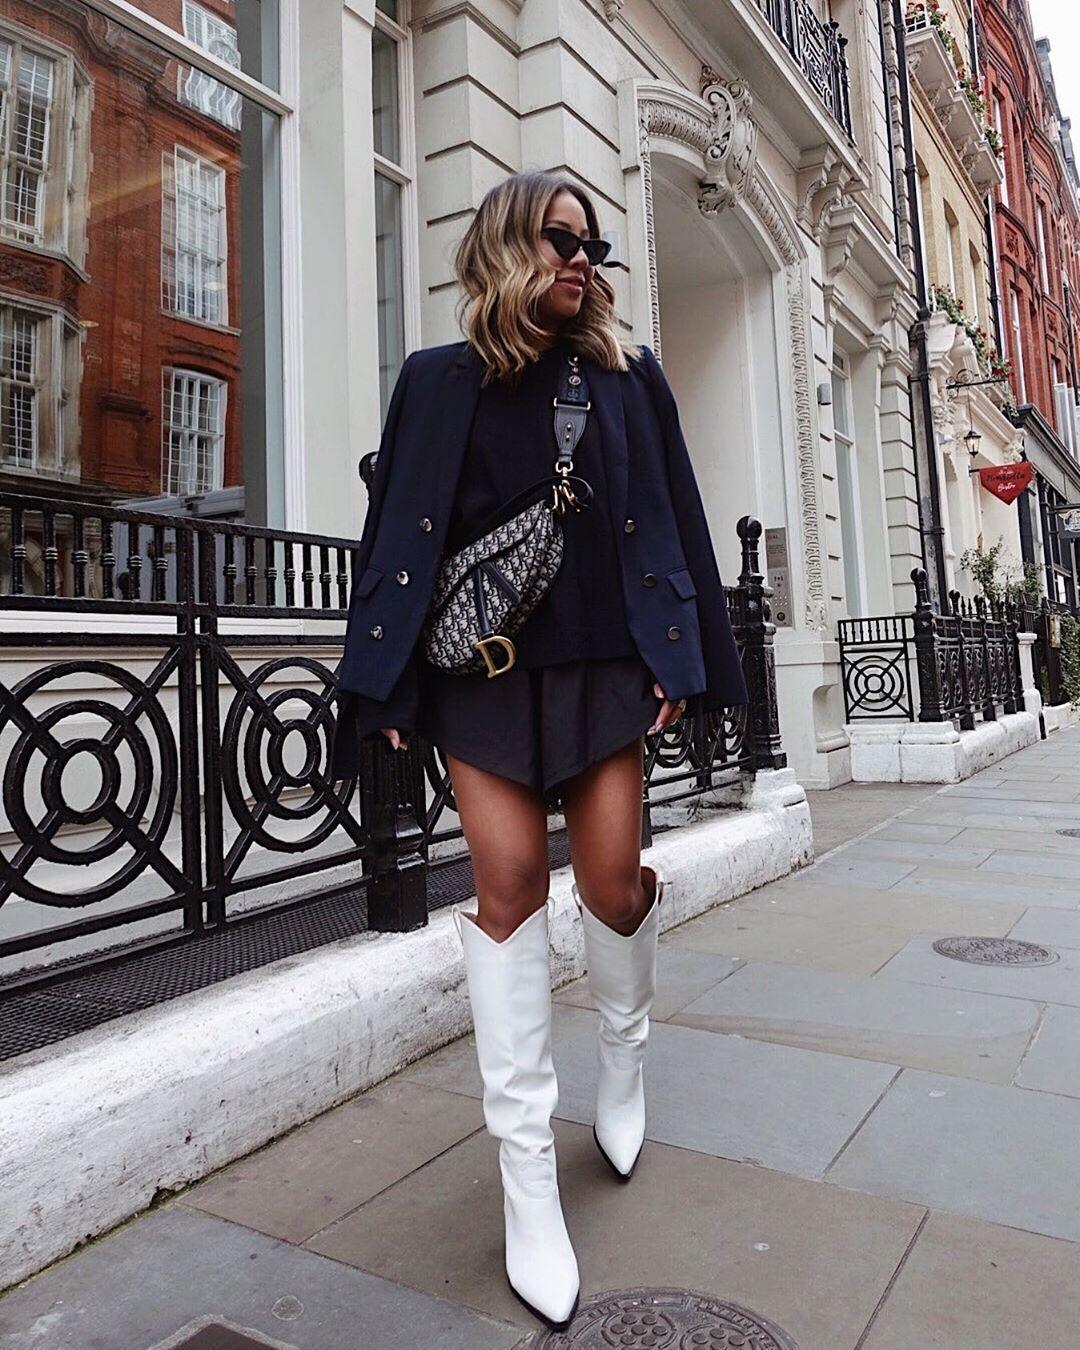 Pin By Maria Jose Mendo Vergara On Womens Fashion White Boots Outfit Fashion Fashion Inspo Outfits [ 1350 x 1080 Pixel ]